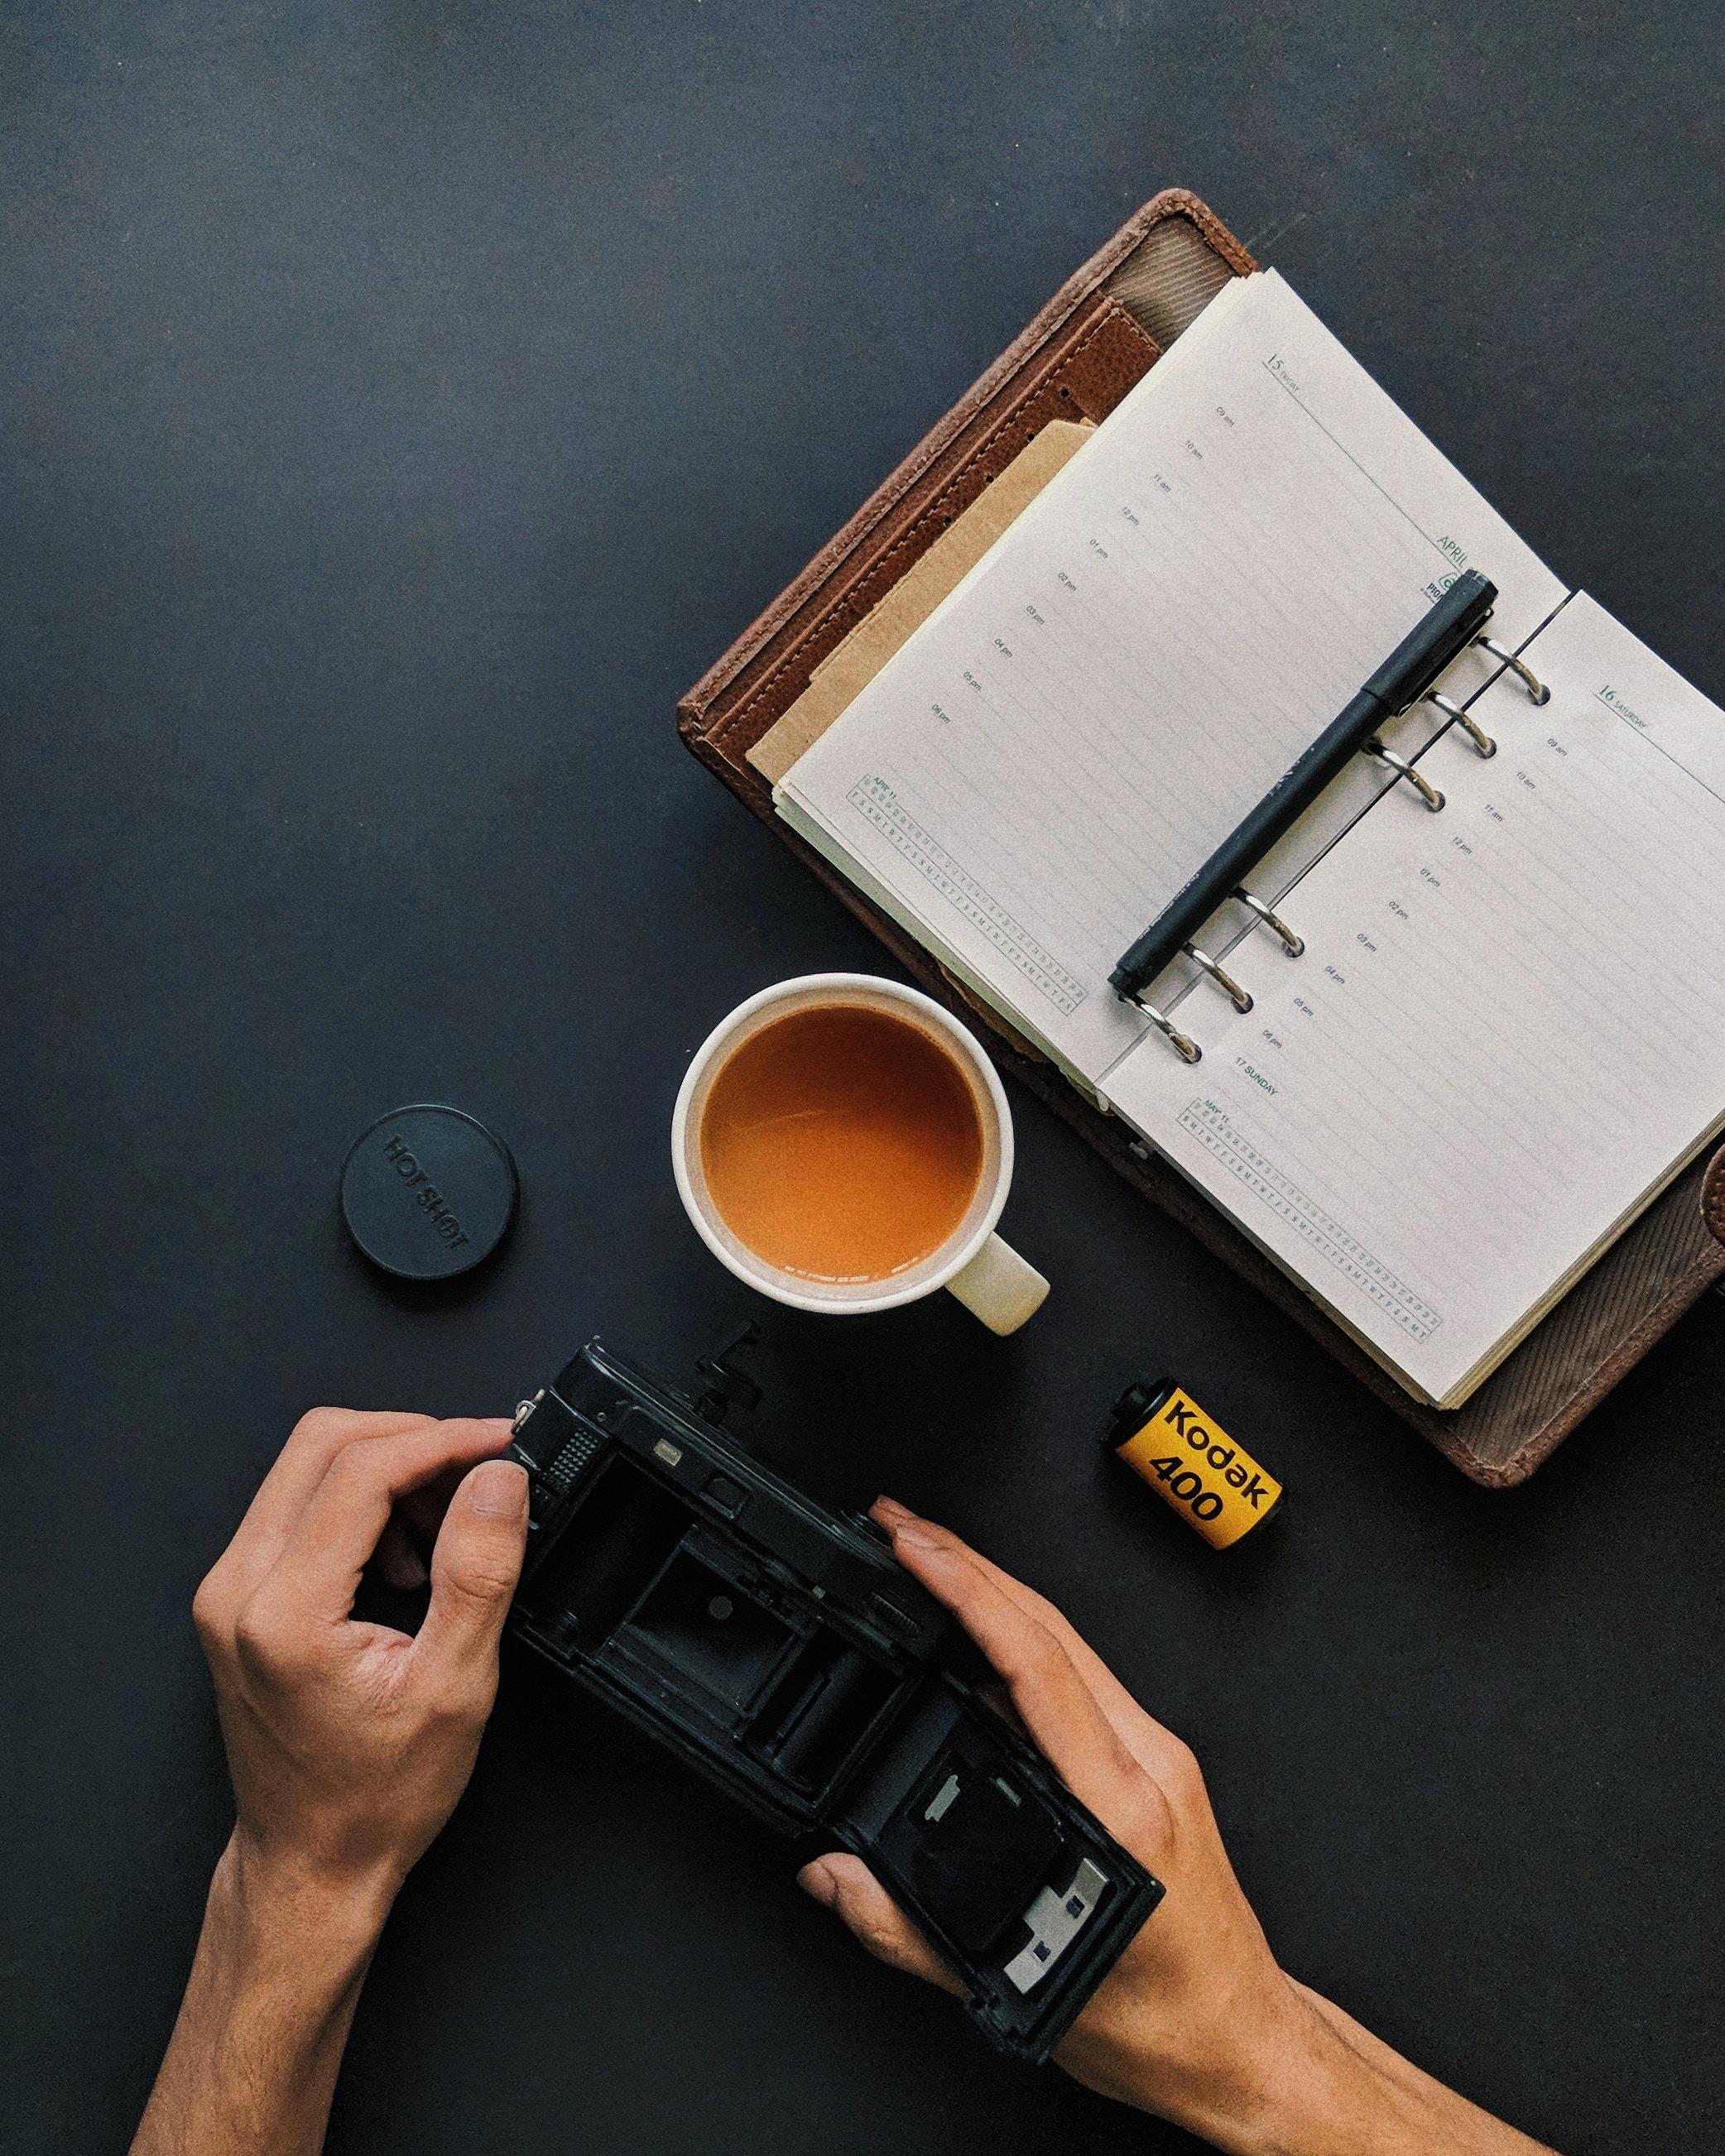 person holding Kodak camera